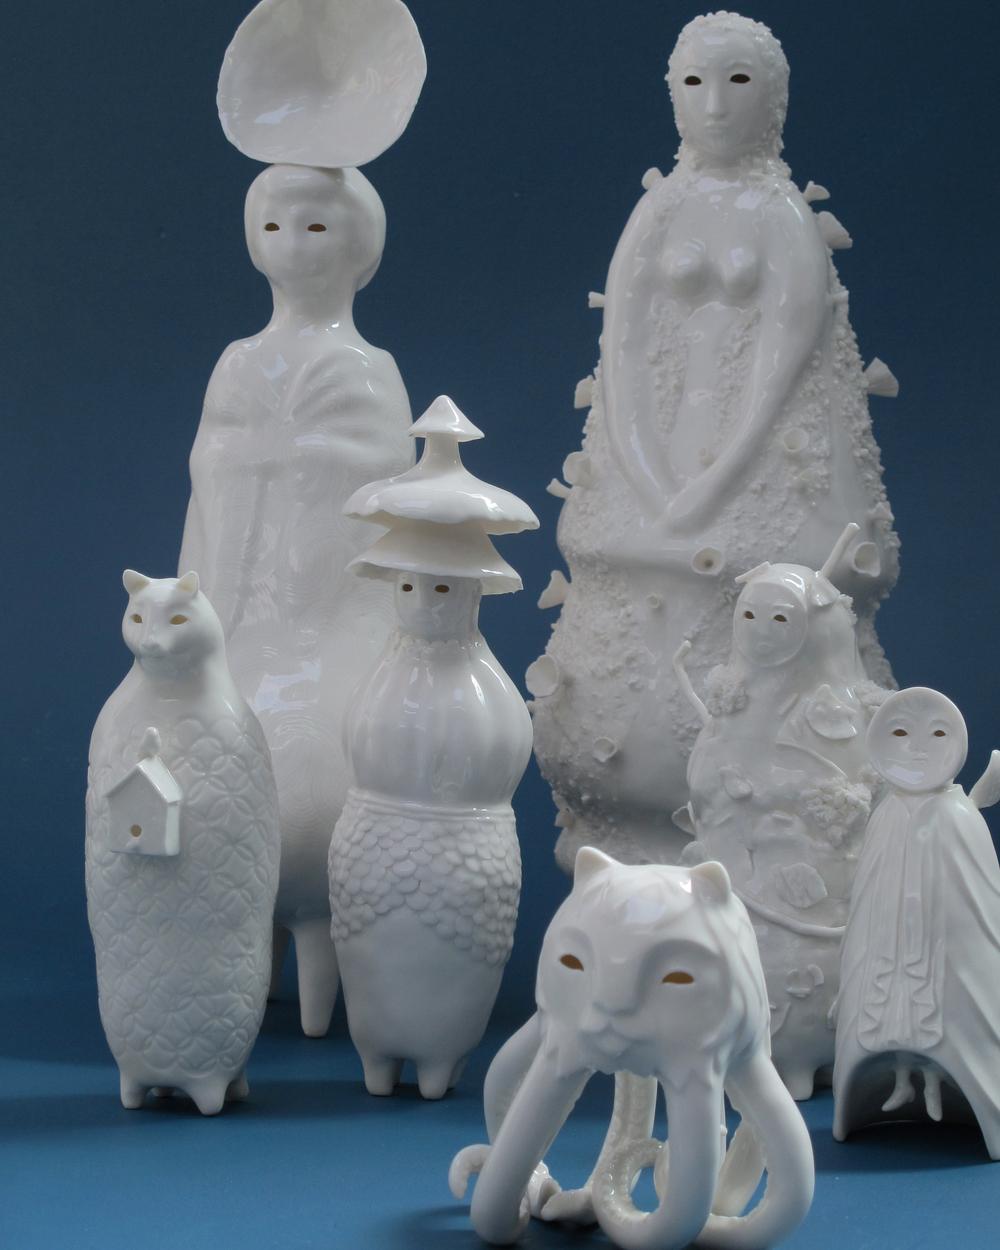 ceramic-artist-animals-mythical-sophie-woodrow.j.jpeg